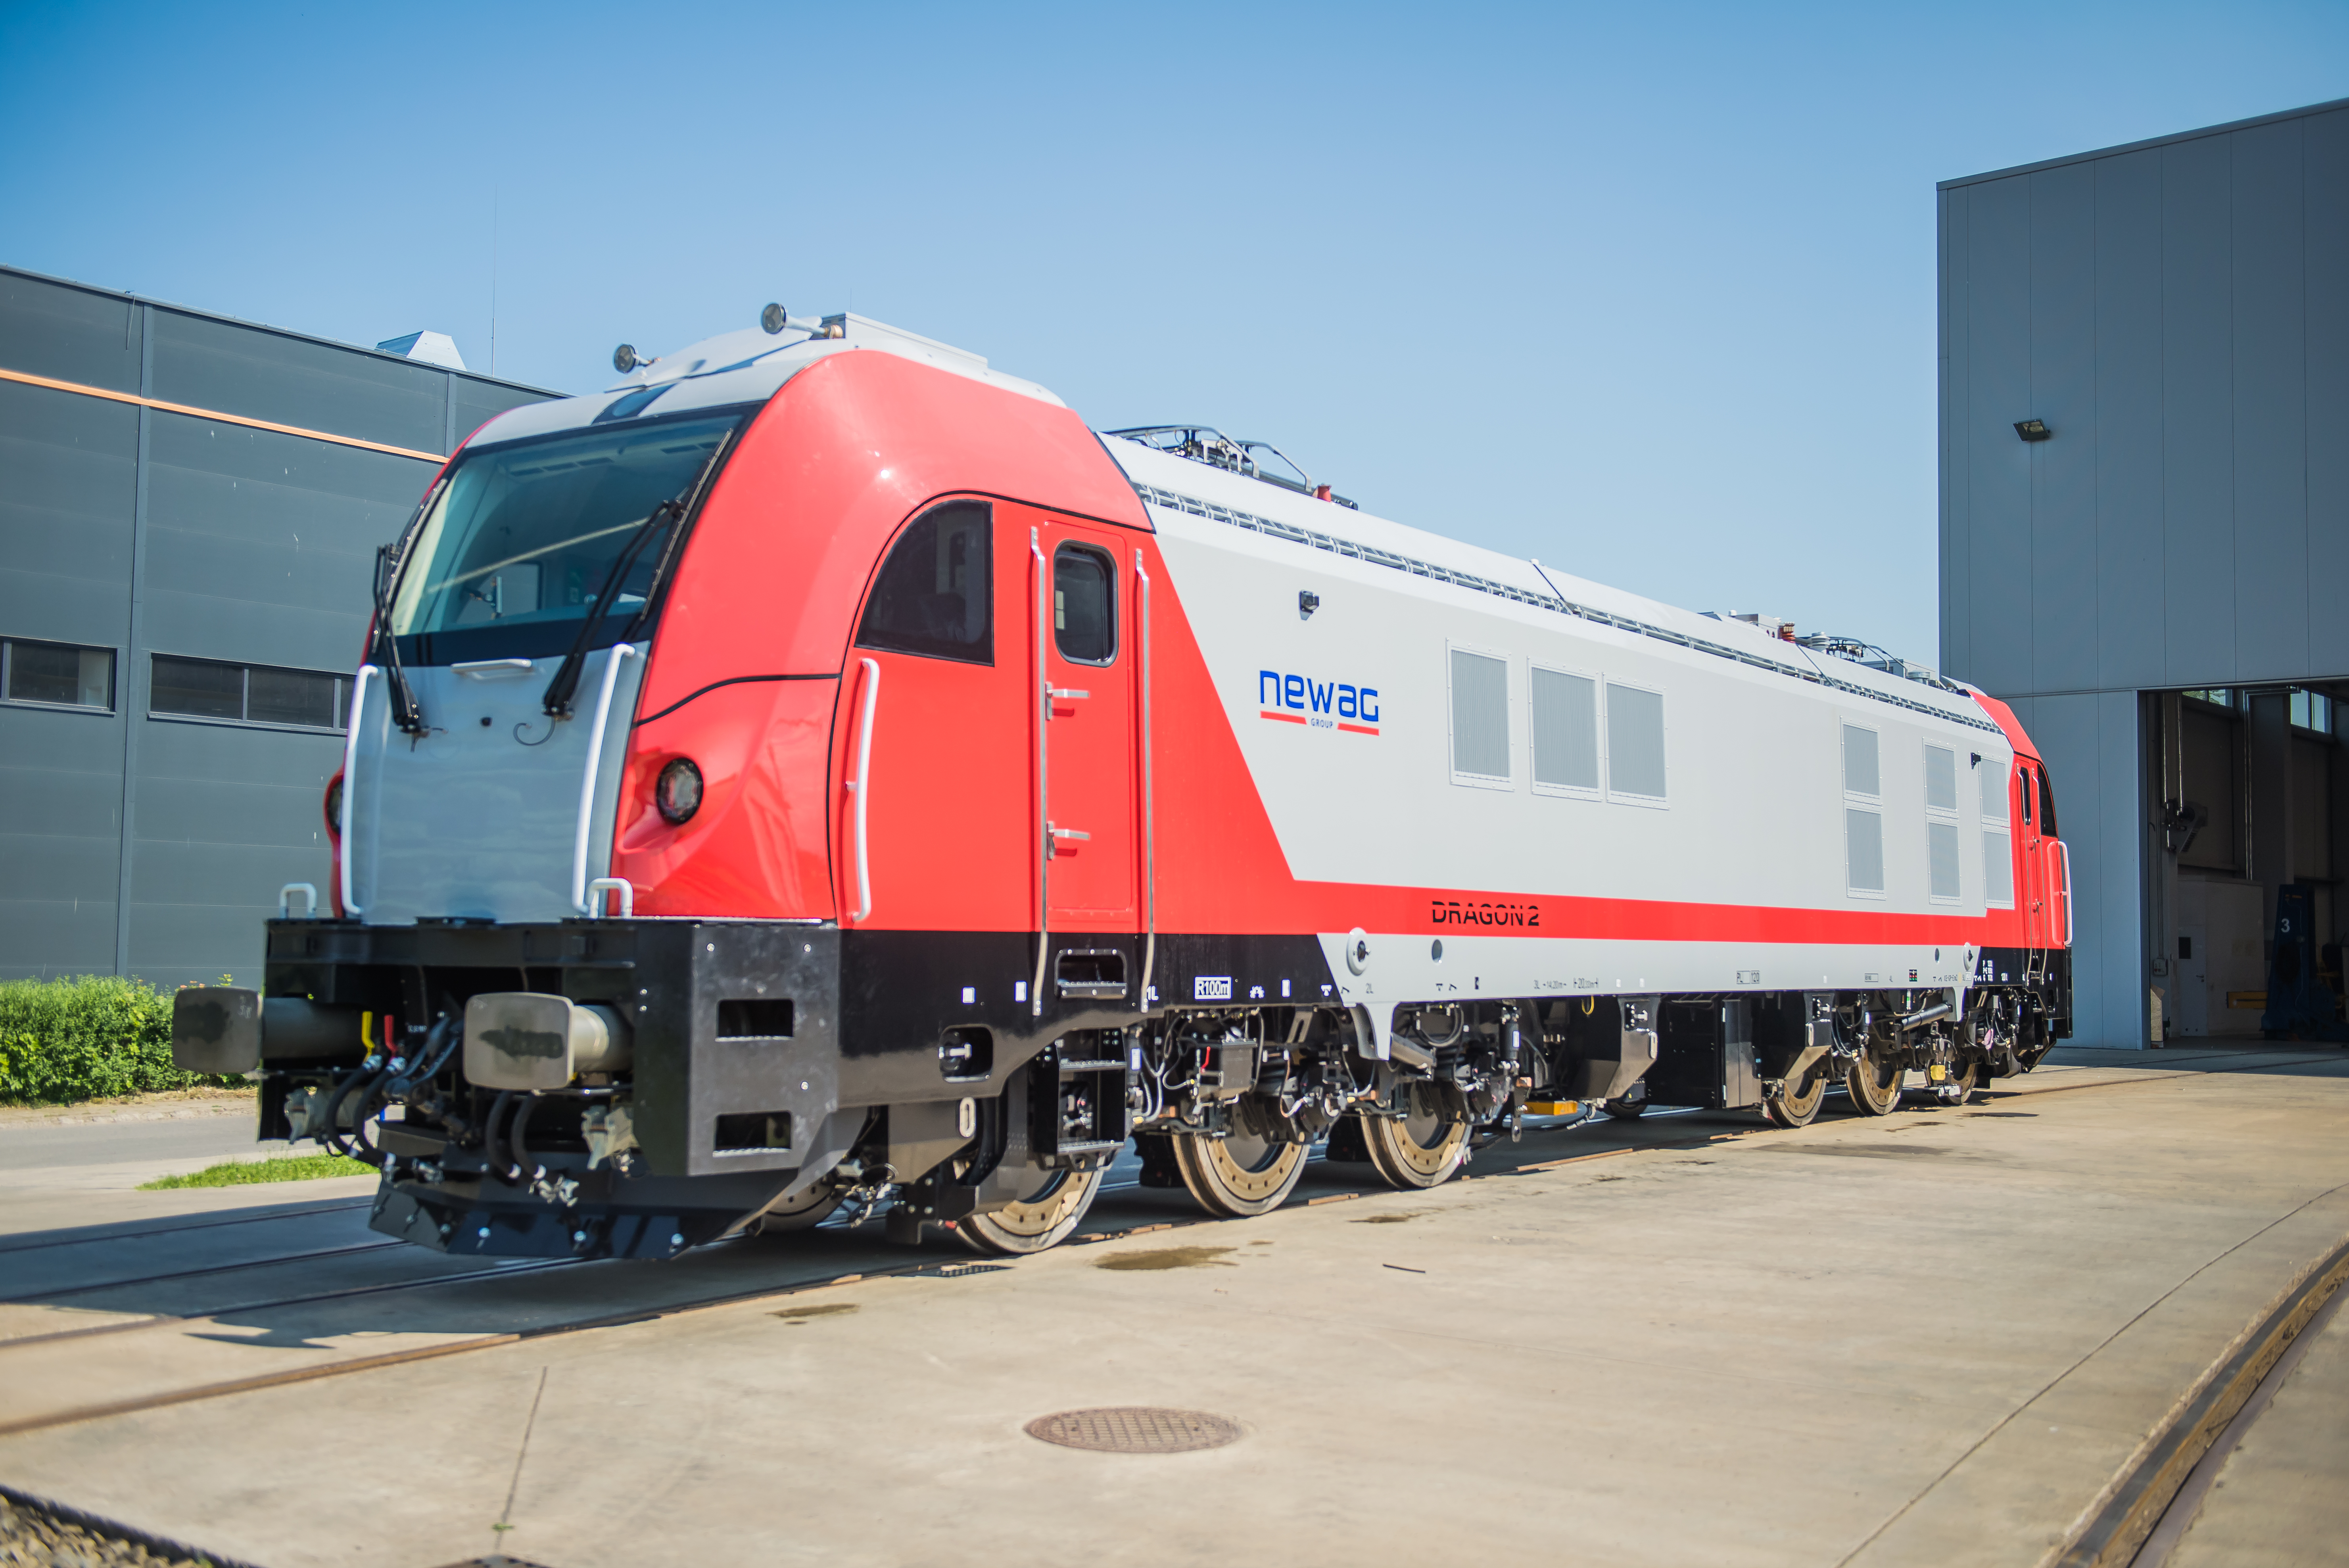 Four DRAGONS for Laude Smart Intermodal